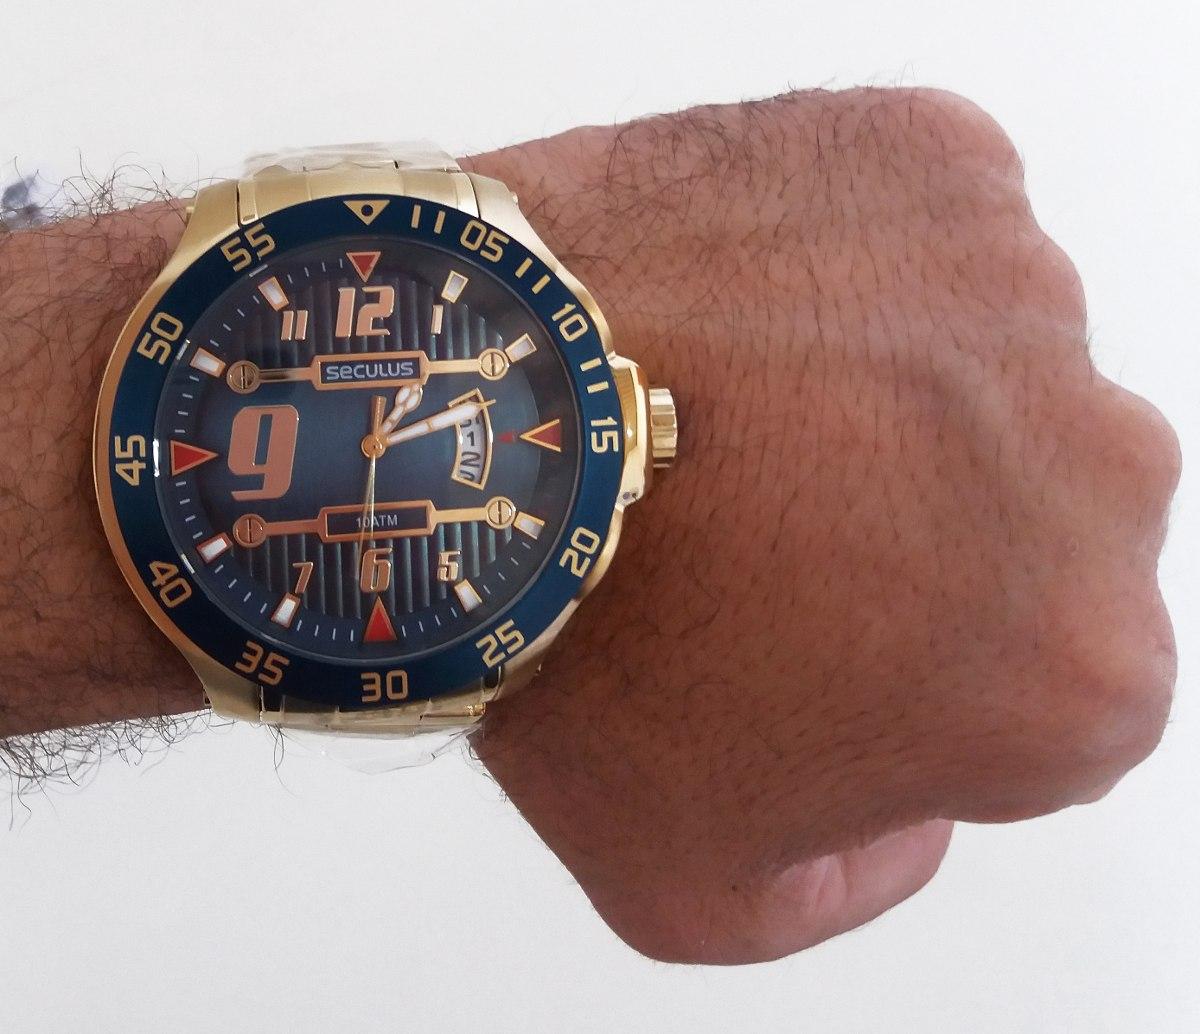 c501493a107 relógio de pulso esportivo de luxo seculus 20295gpsvda1 gold. Carregando  zoom.